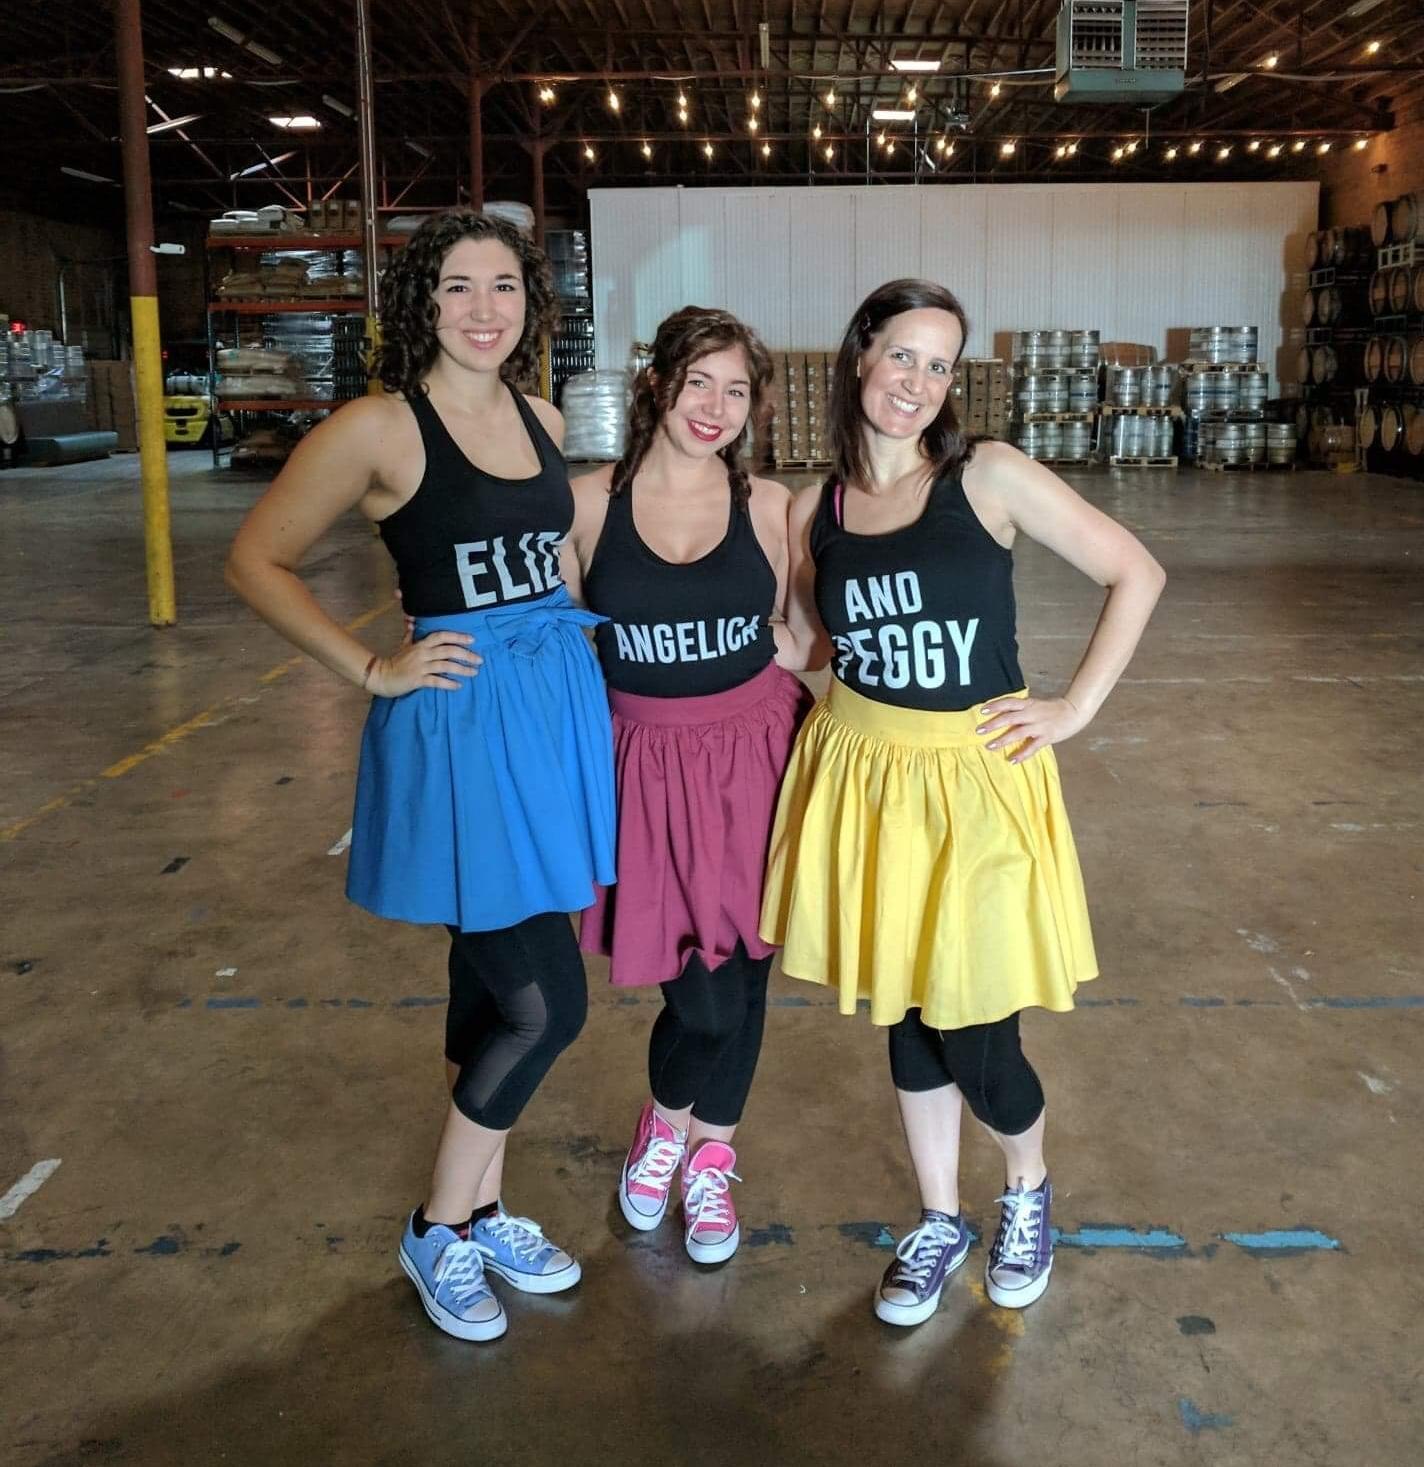 Kelsey Fuller (Eliza), Paige Reinhard (Angelica) & D'Arcy Astridge (Peggy) in Jamilton, Nov. 2017.